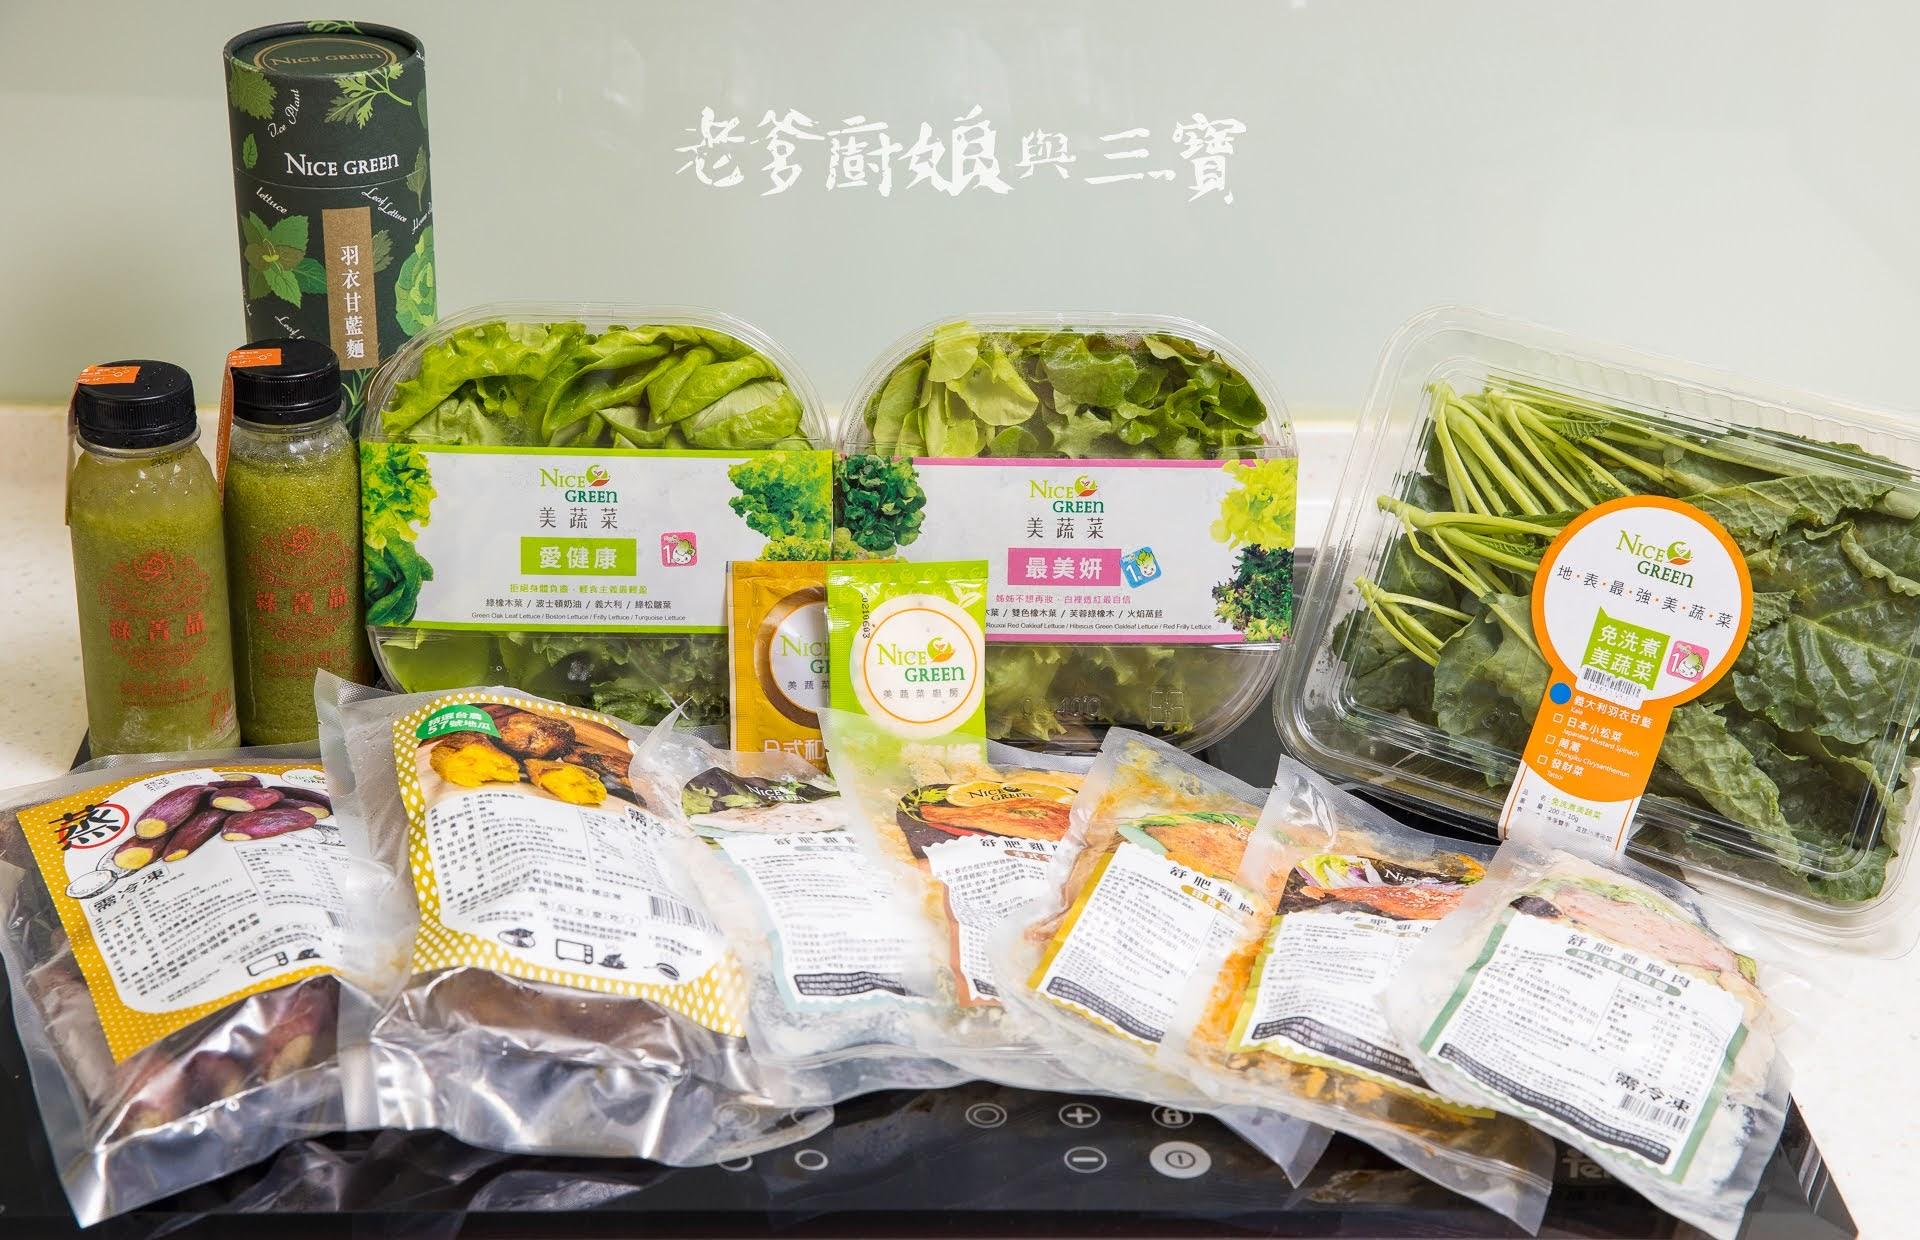 NICE GREEn 【生菜宅配】【蔬果汁】